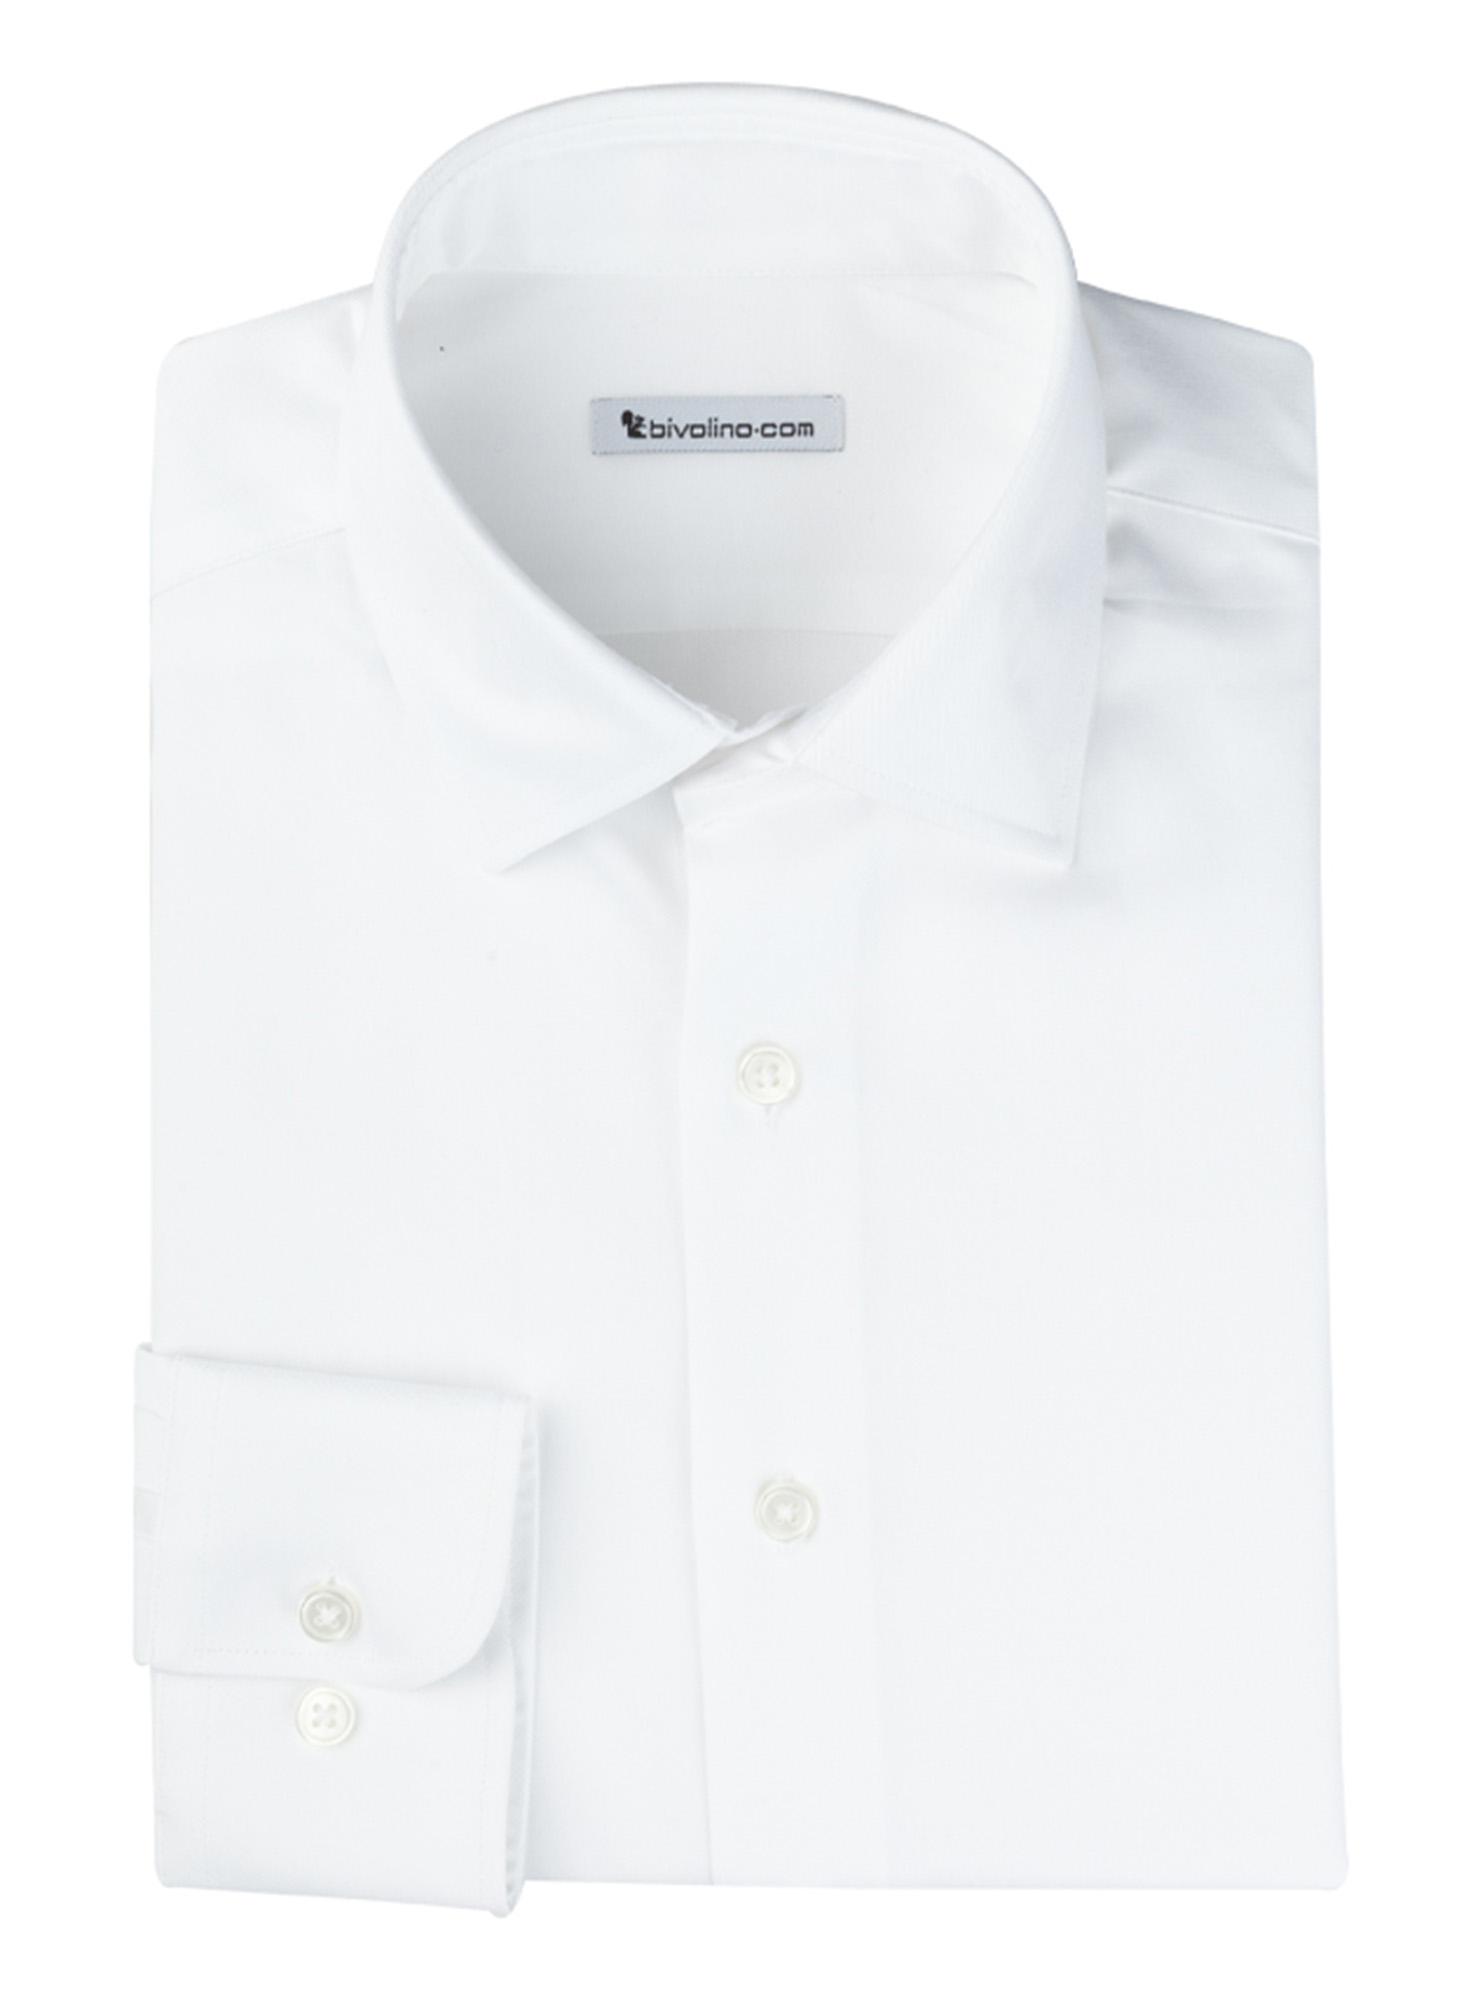 LAZIO - men shirt cotton two-fold 2ply Egyptian - Thomas Mason - RIBU 1